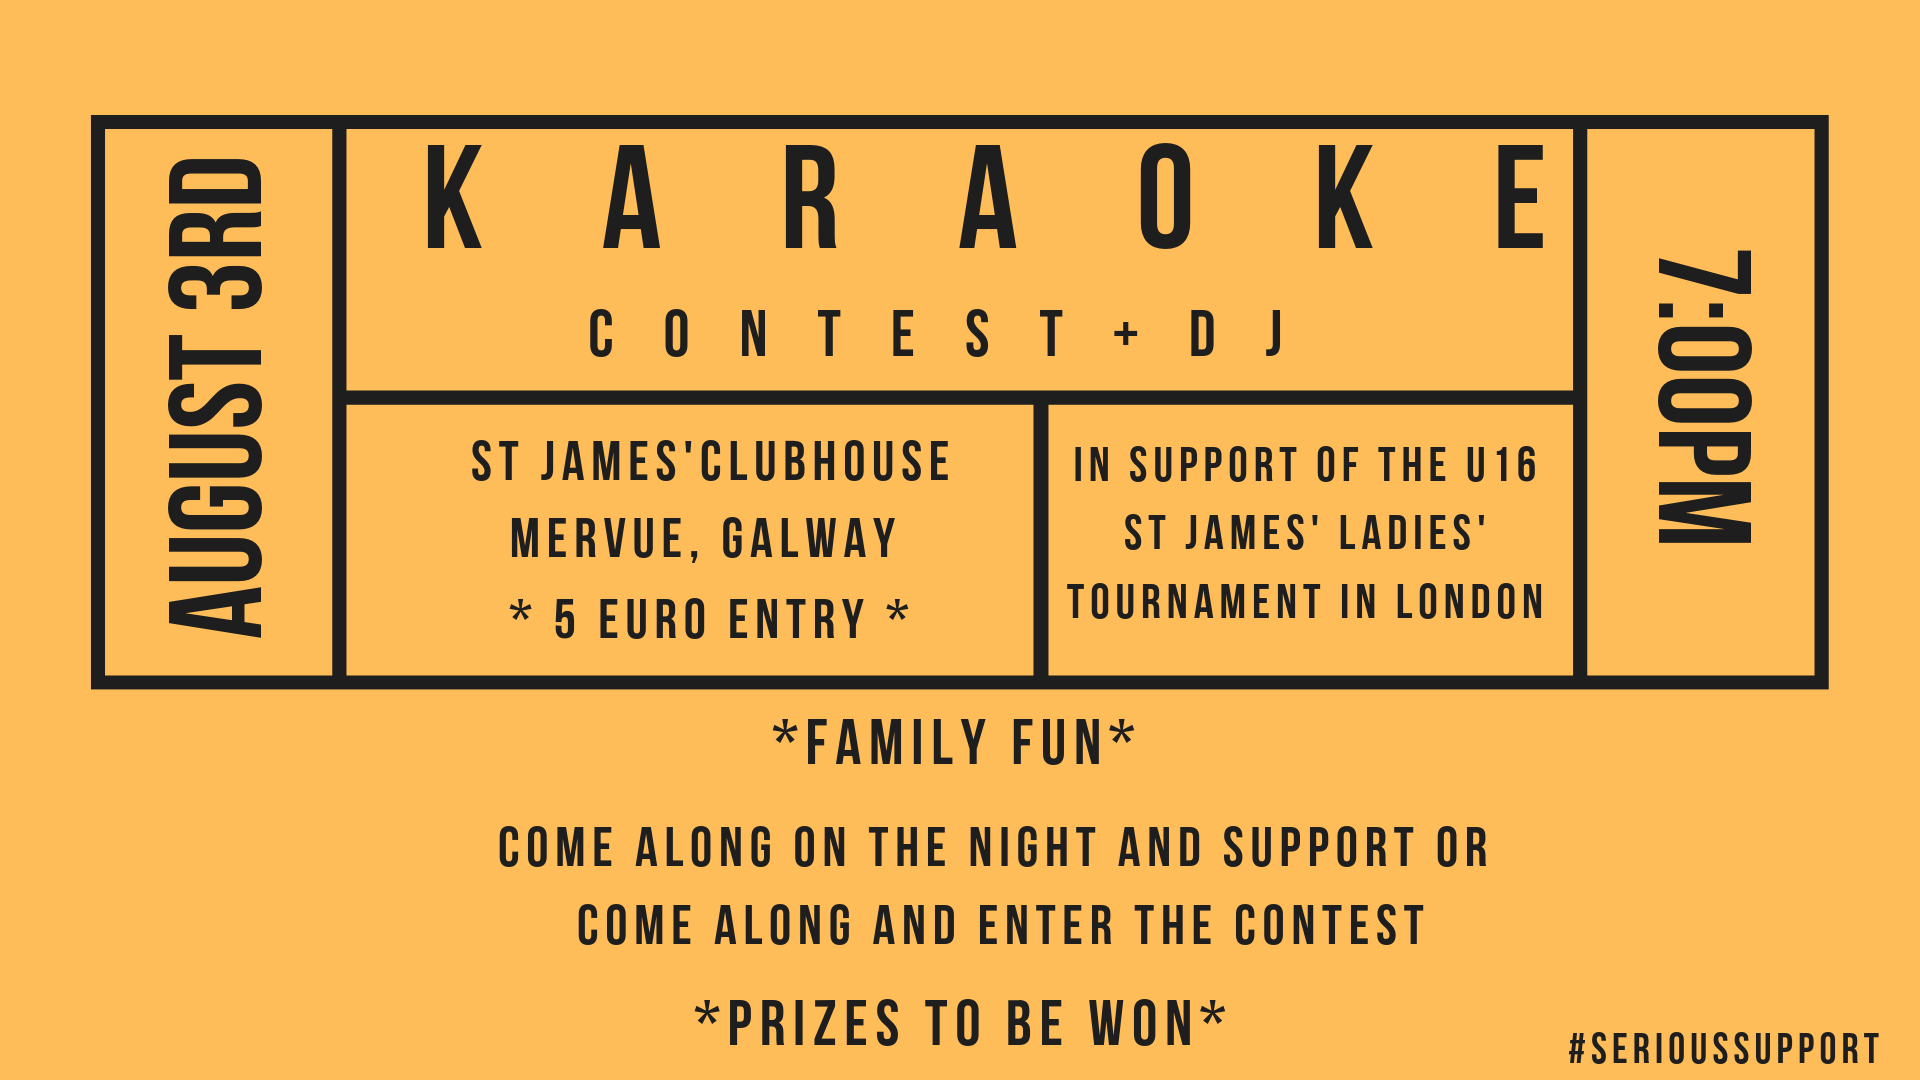 Karaoke Contest Fundraiser - Travel Inspires Experiences